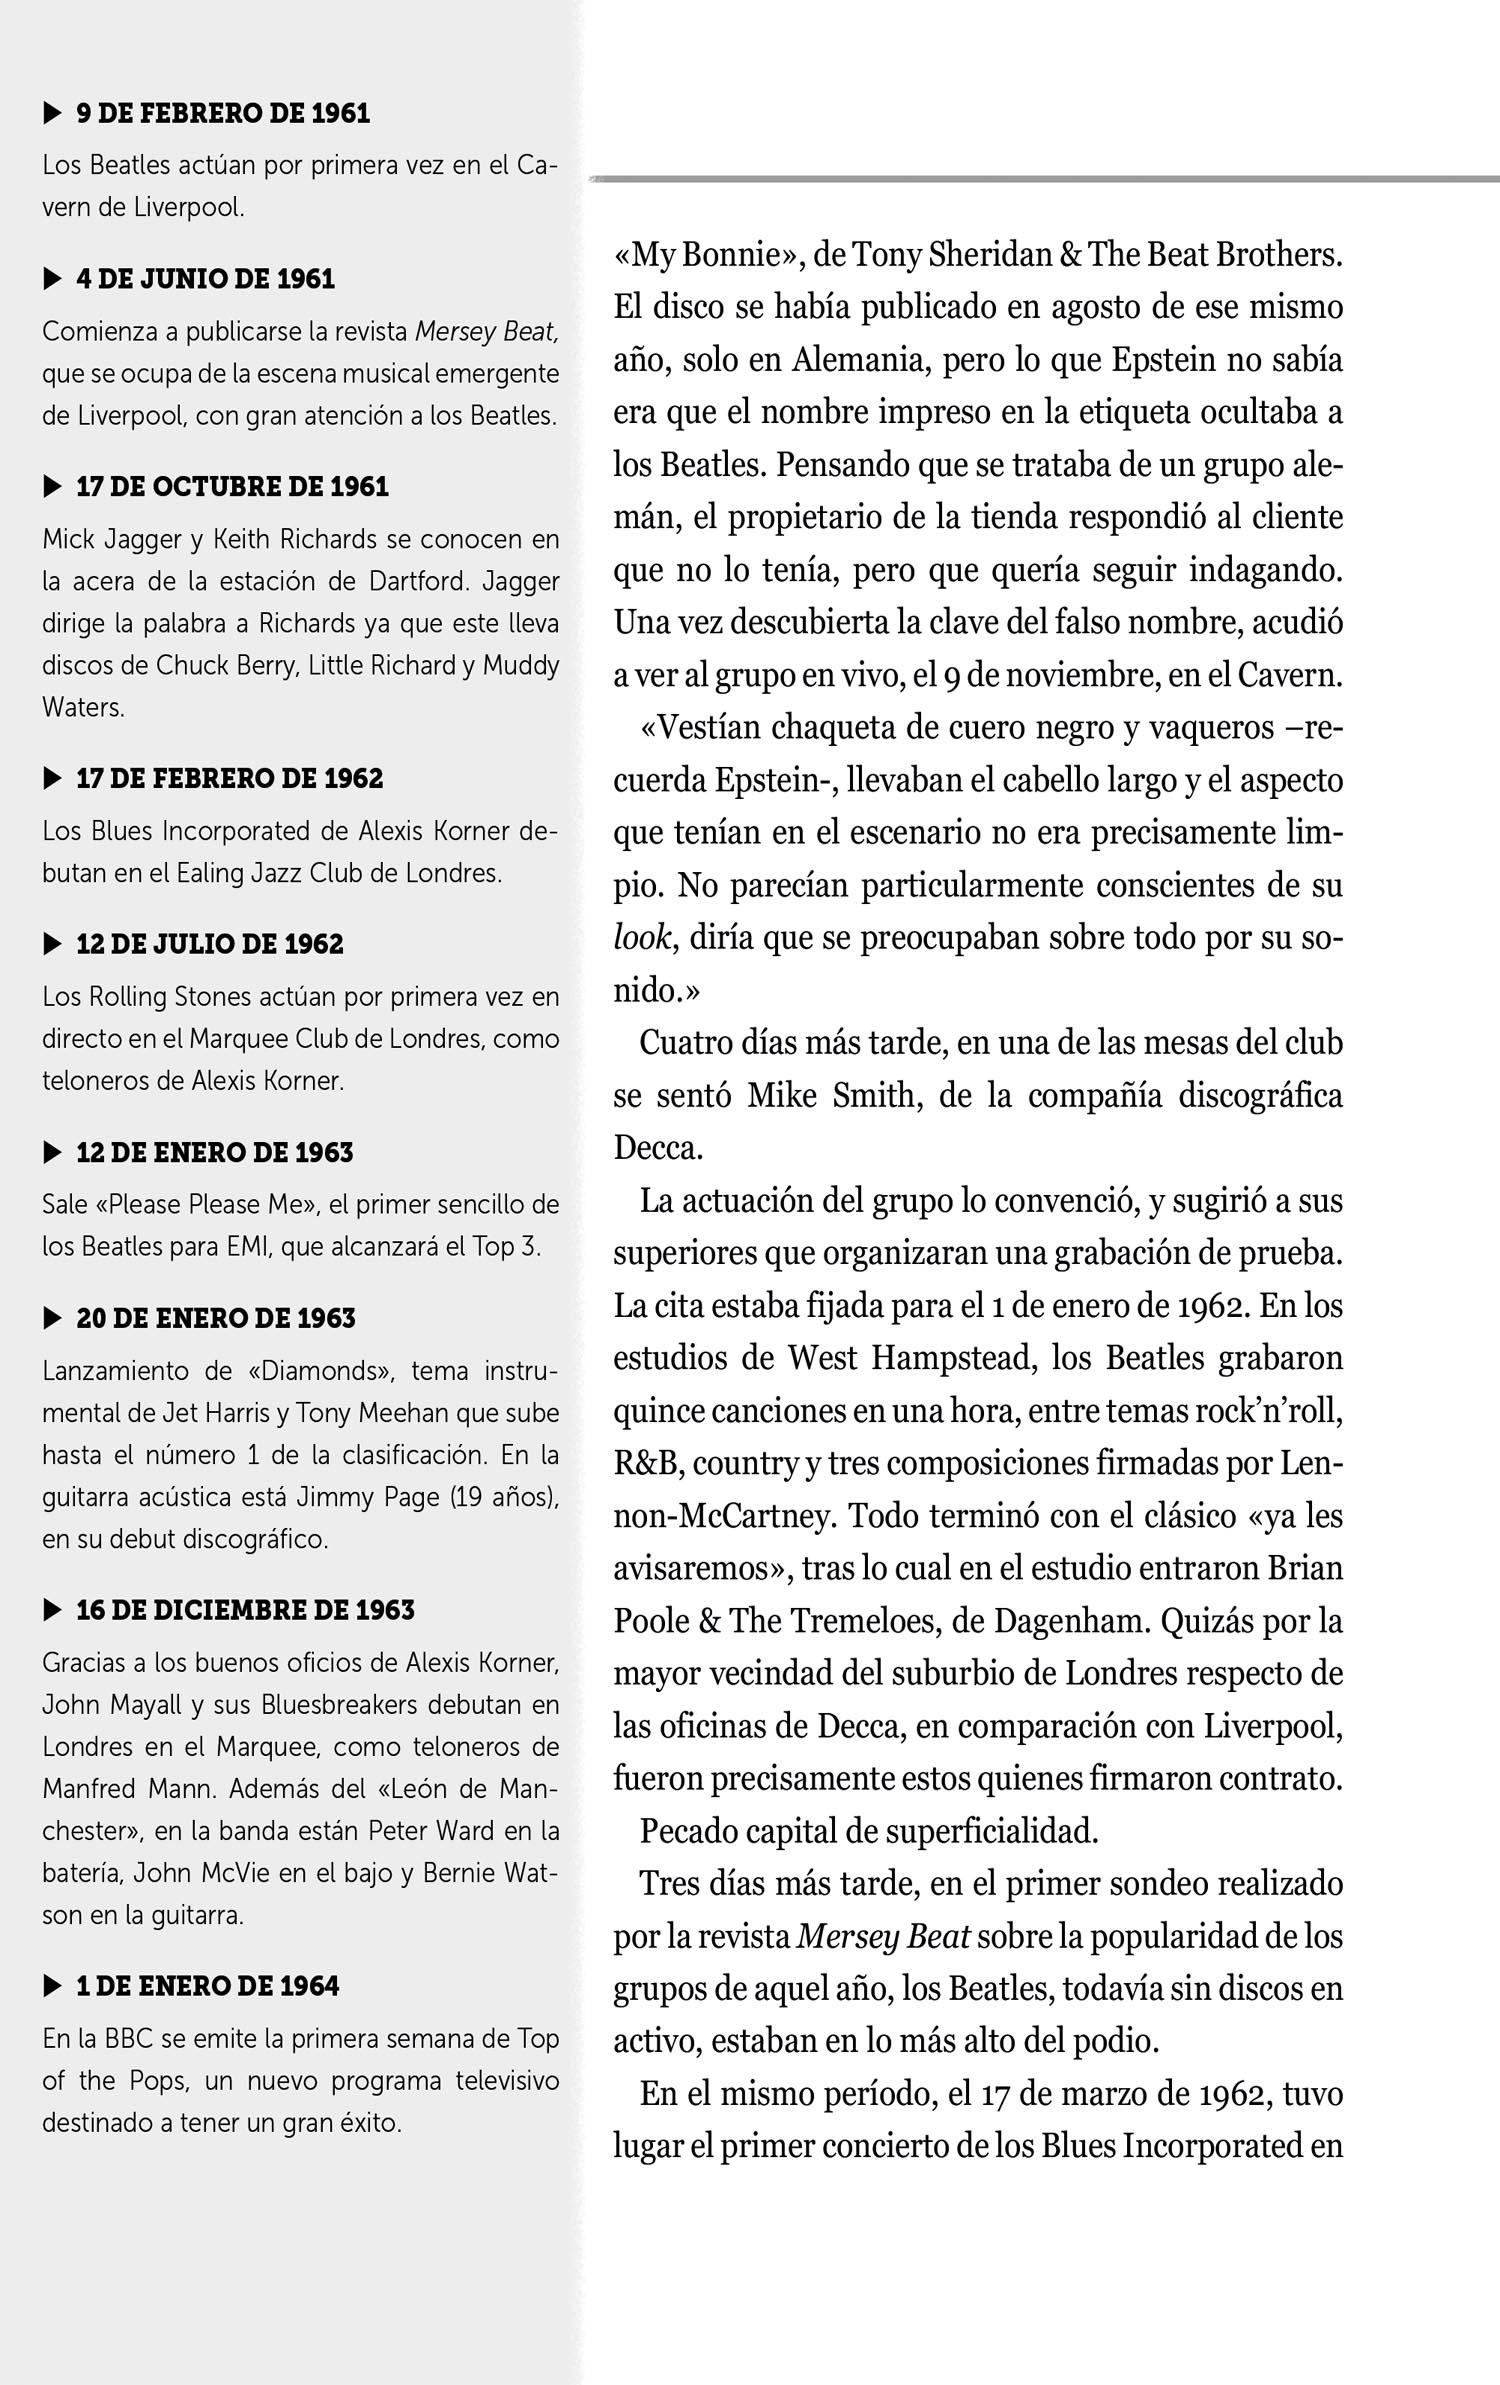 cronica5.jpg